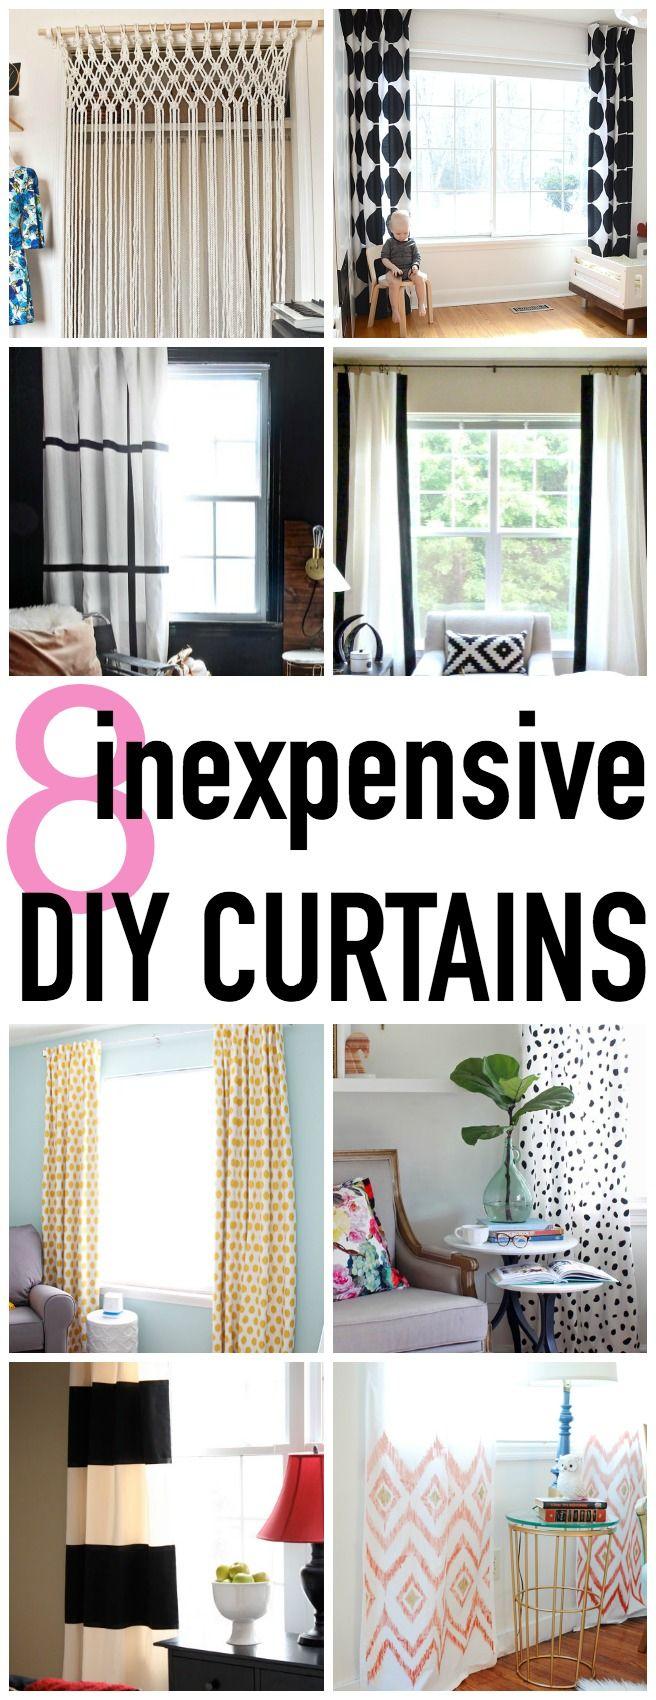 Decor Hacks : 8 super stylish and easy DIY Curtain tutorials